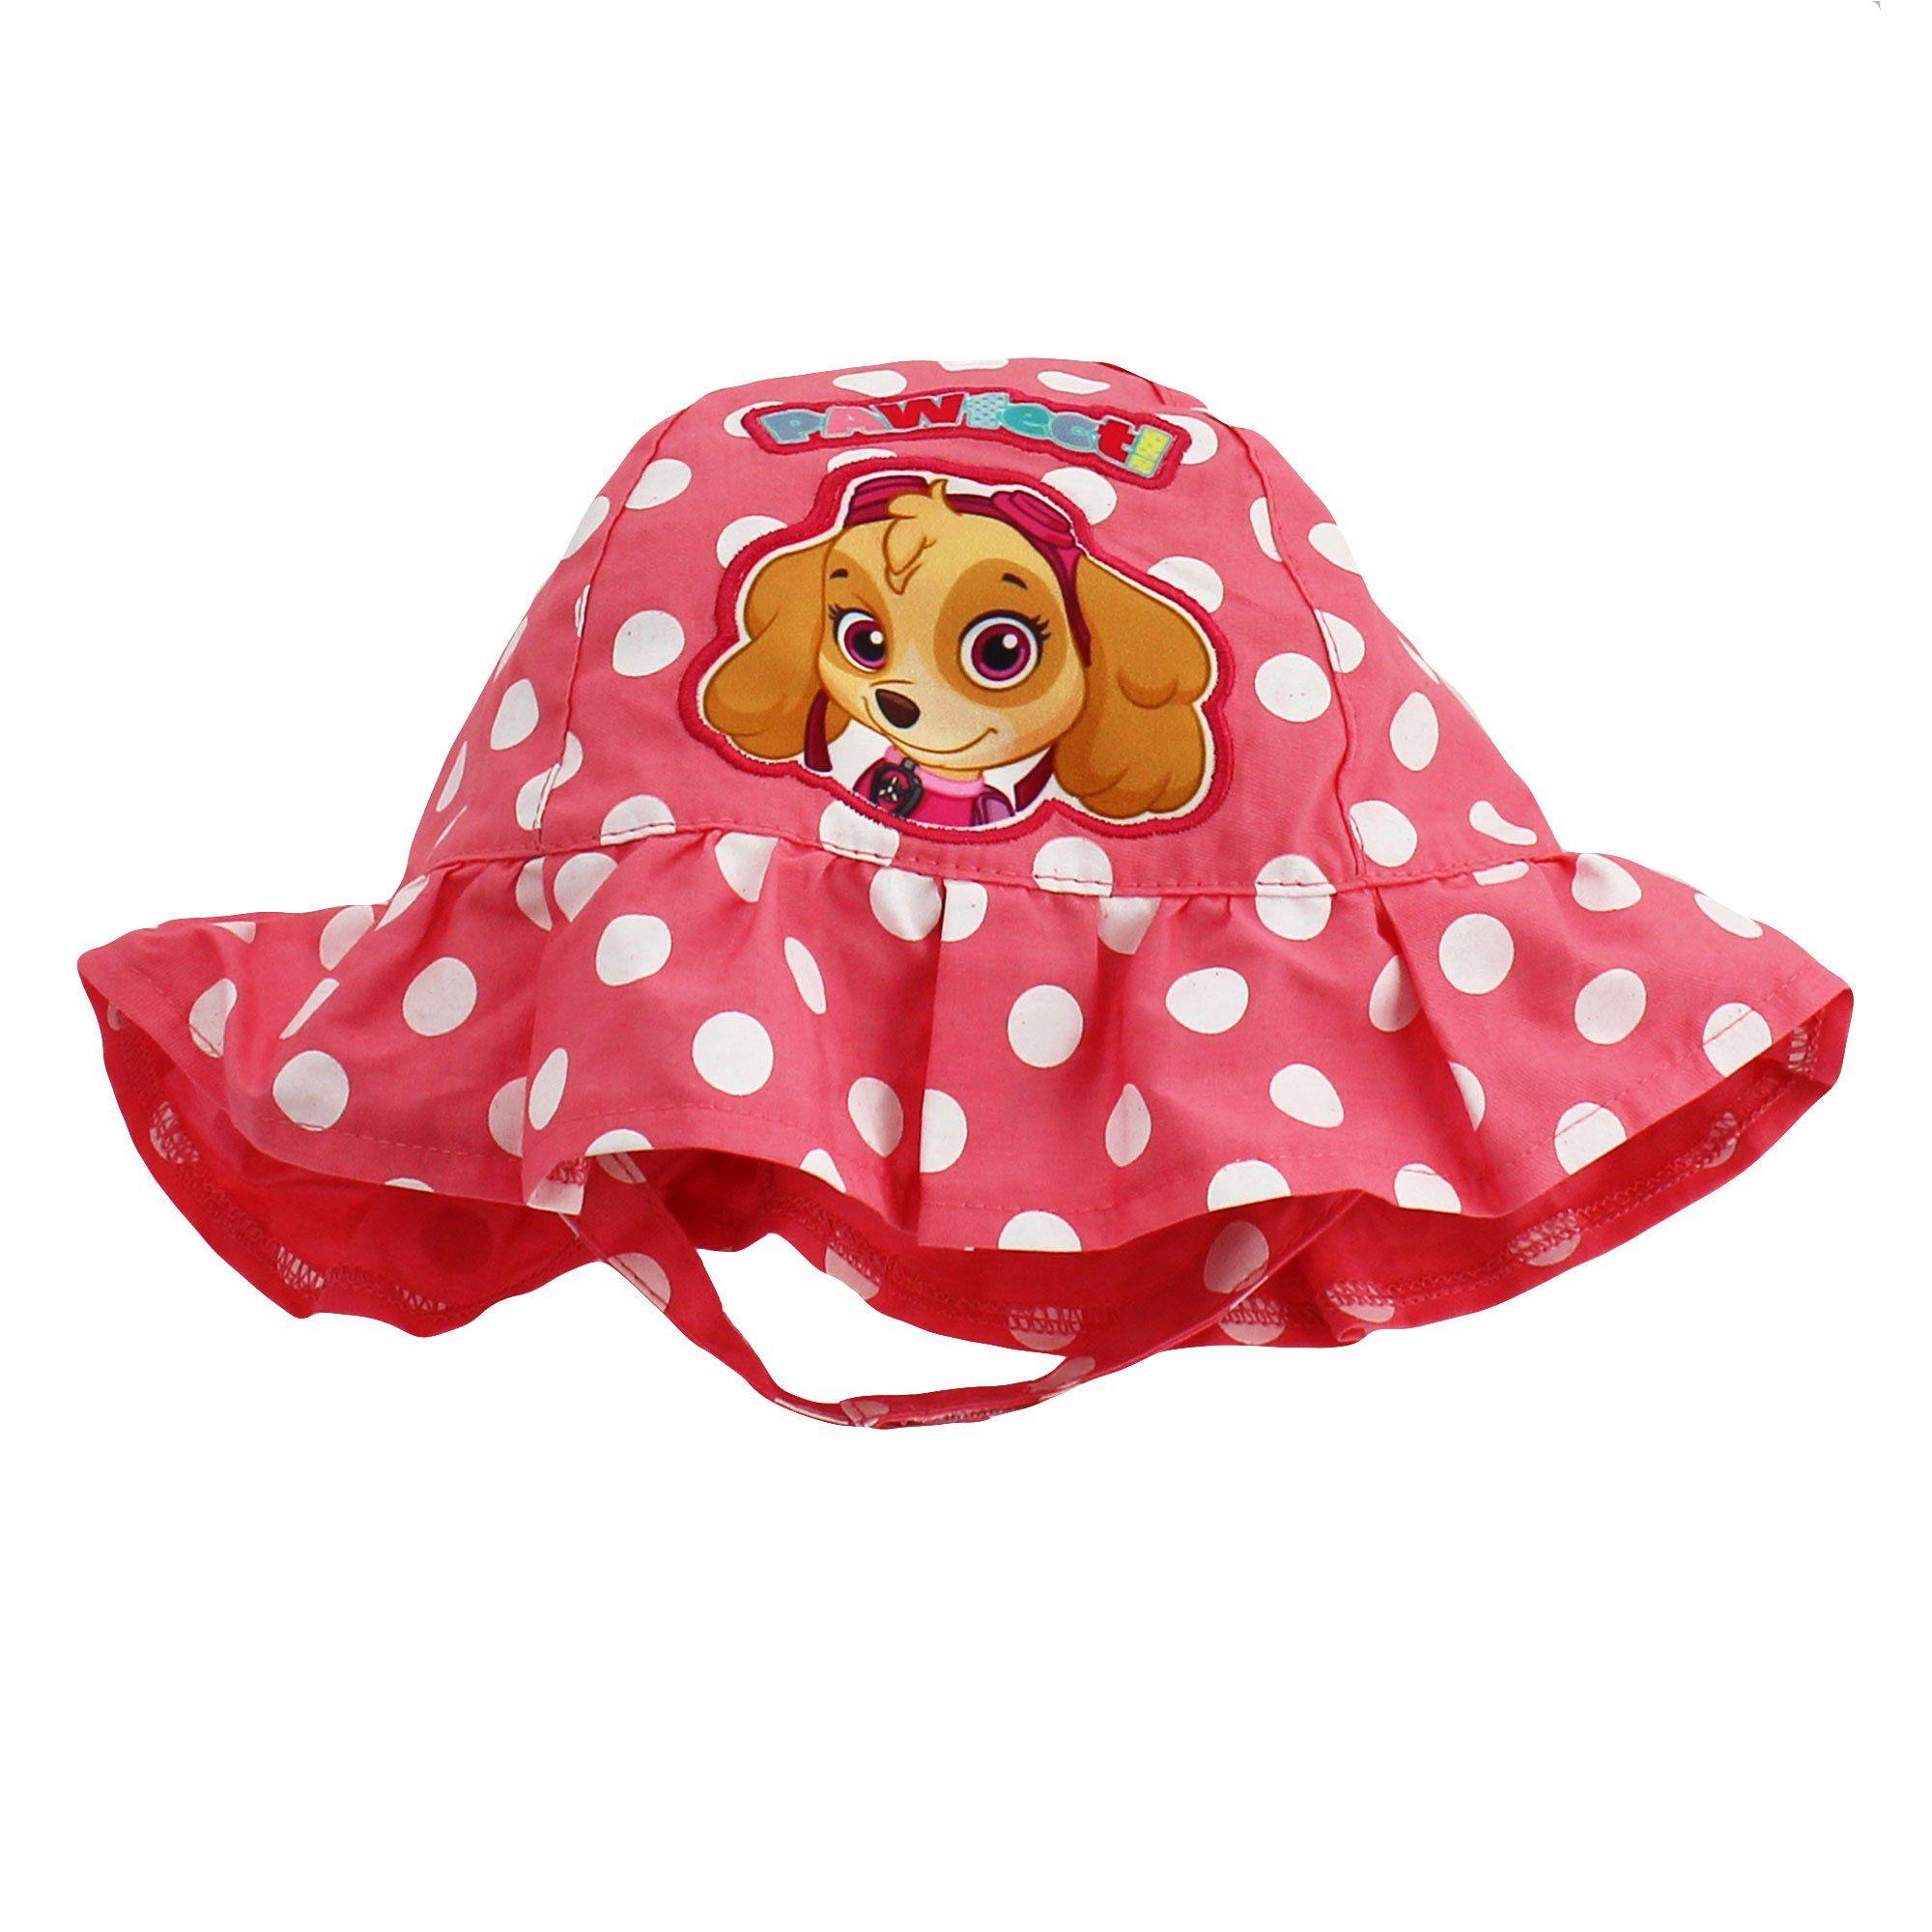 64d19af9a Paw Patrol Nickelodeon Nick Jr Skye Toddler Girls Sun Hat Bucket Hat ...